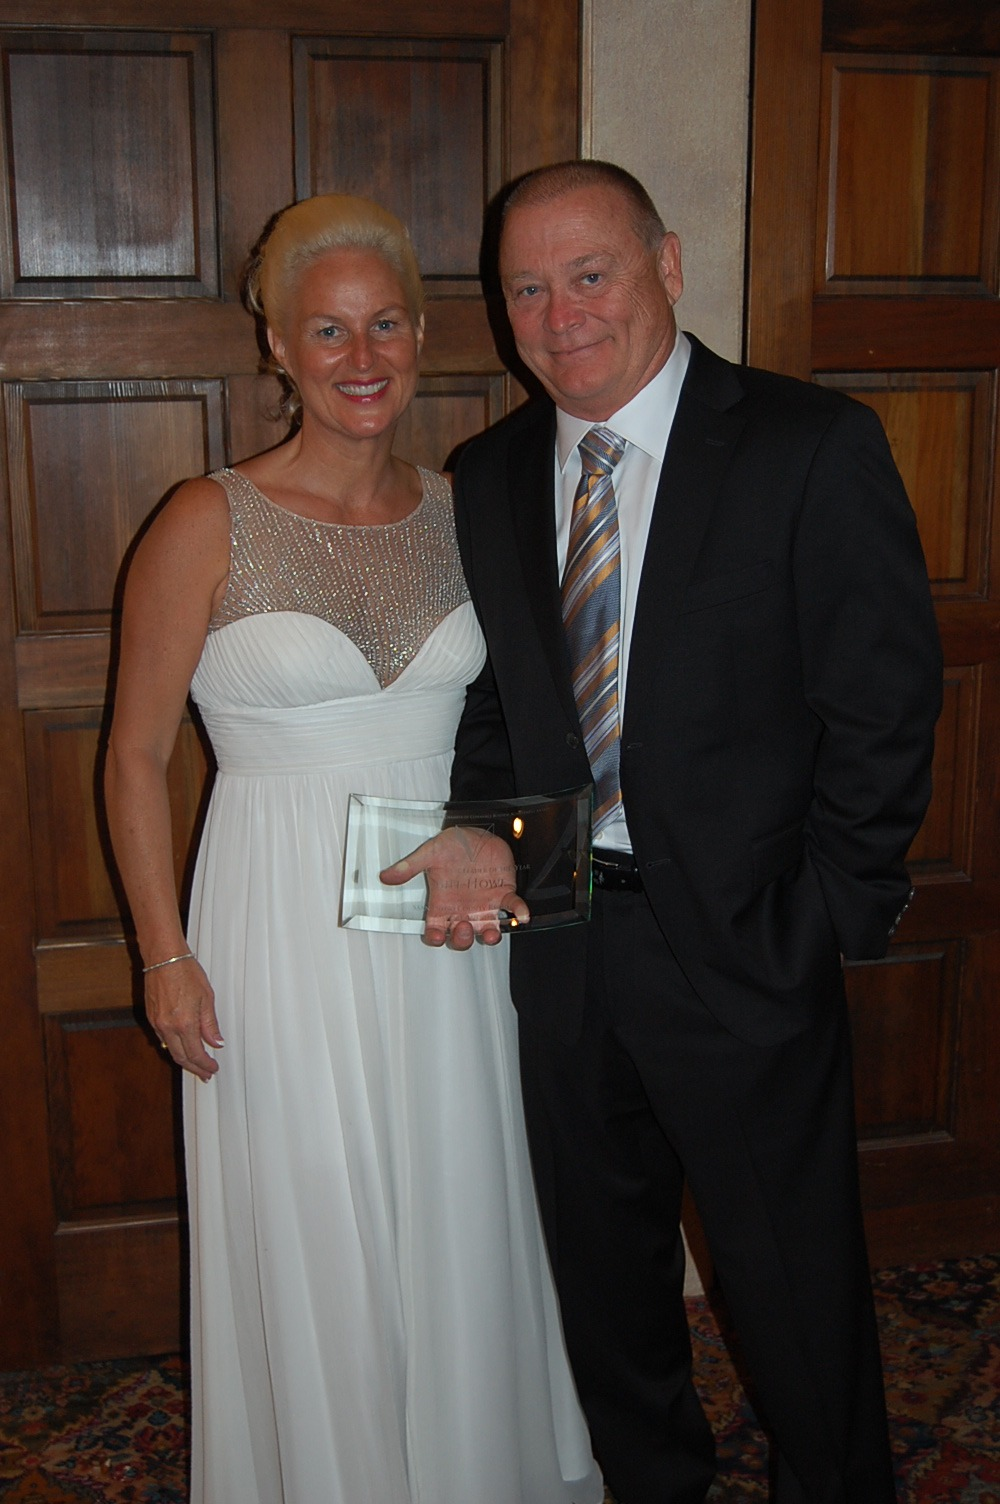 Bill Howe of Bill Howe Plumbing wins Business Leader of the Year Award